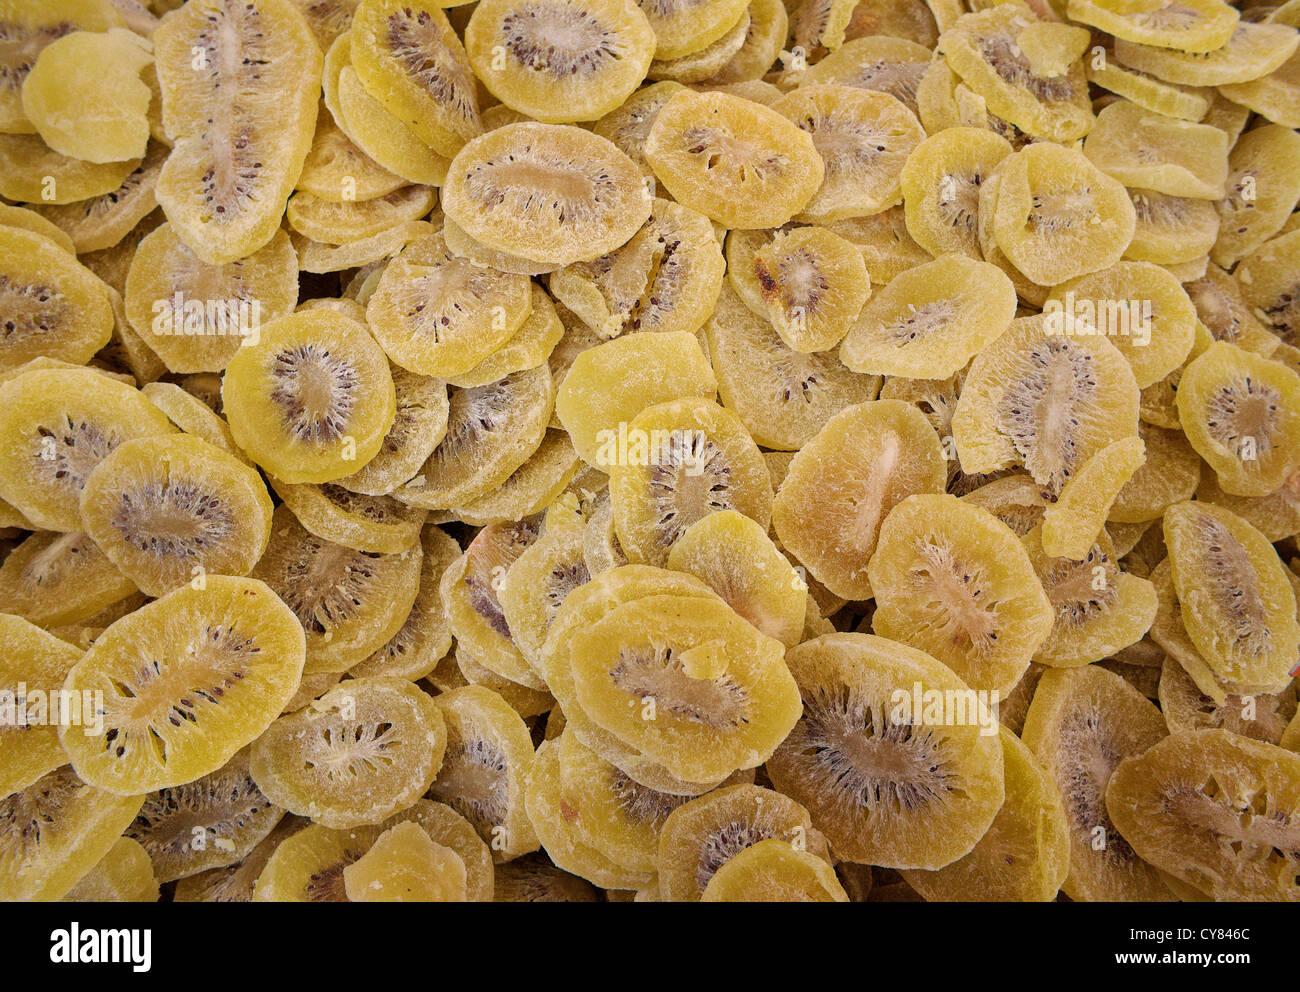 Candied kiwi slices - Stock Image